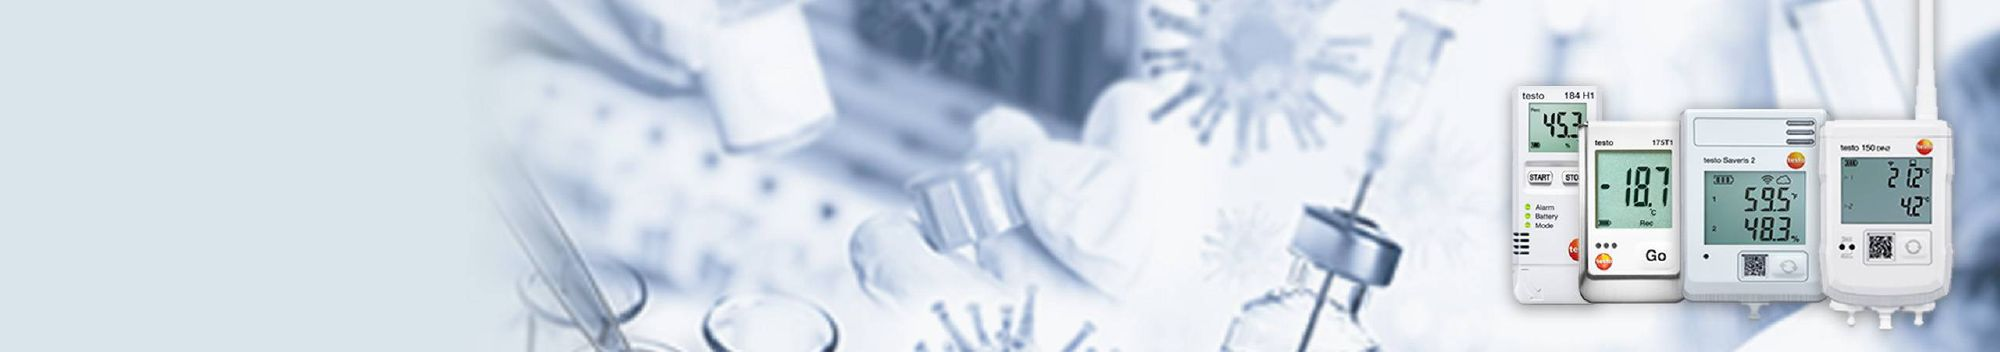 <b>백신의 안전한 운송&bull;보관</b>을 <br /> 위한 테스토 측정 솔루션